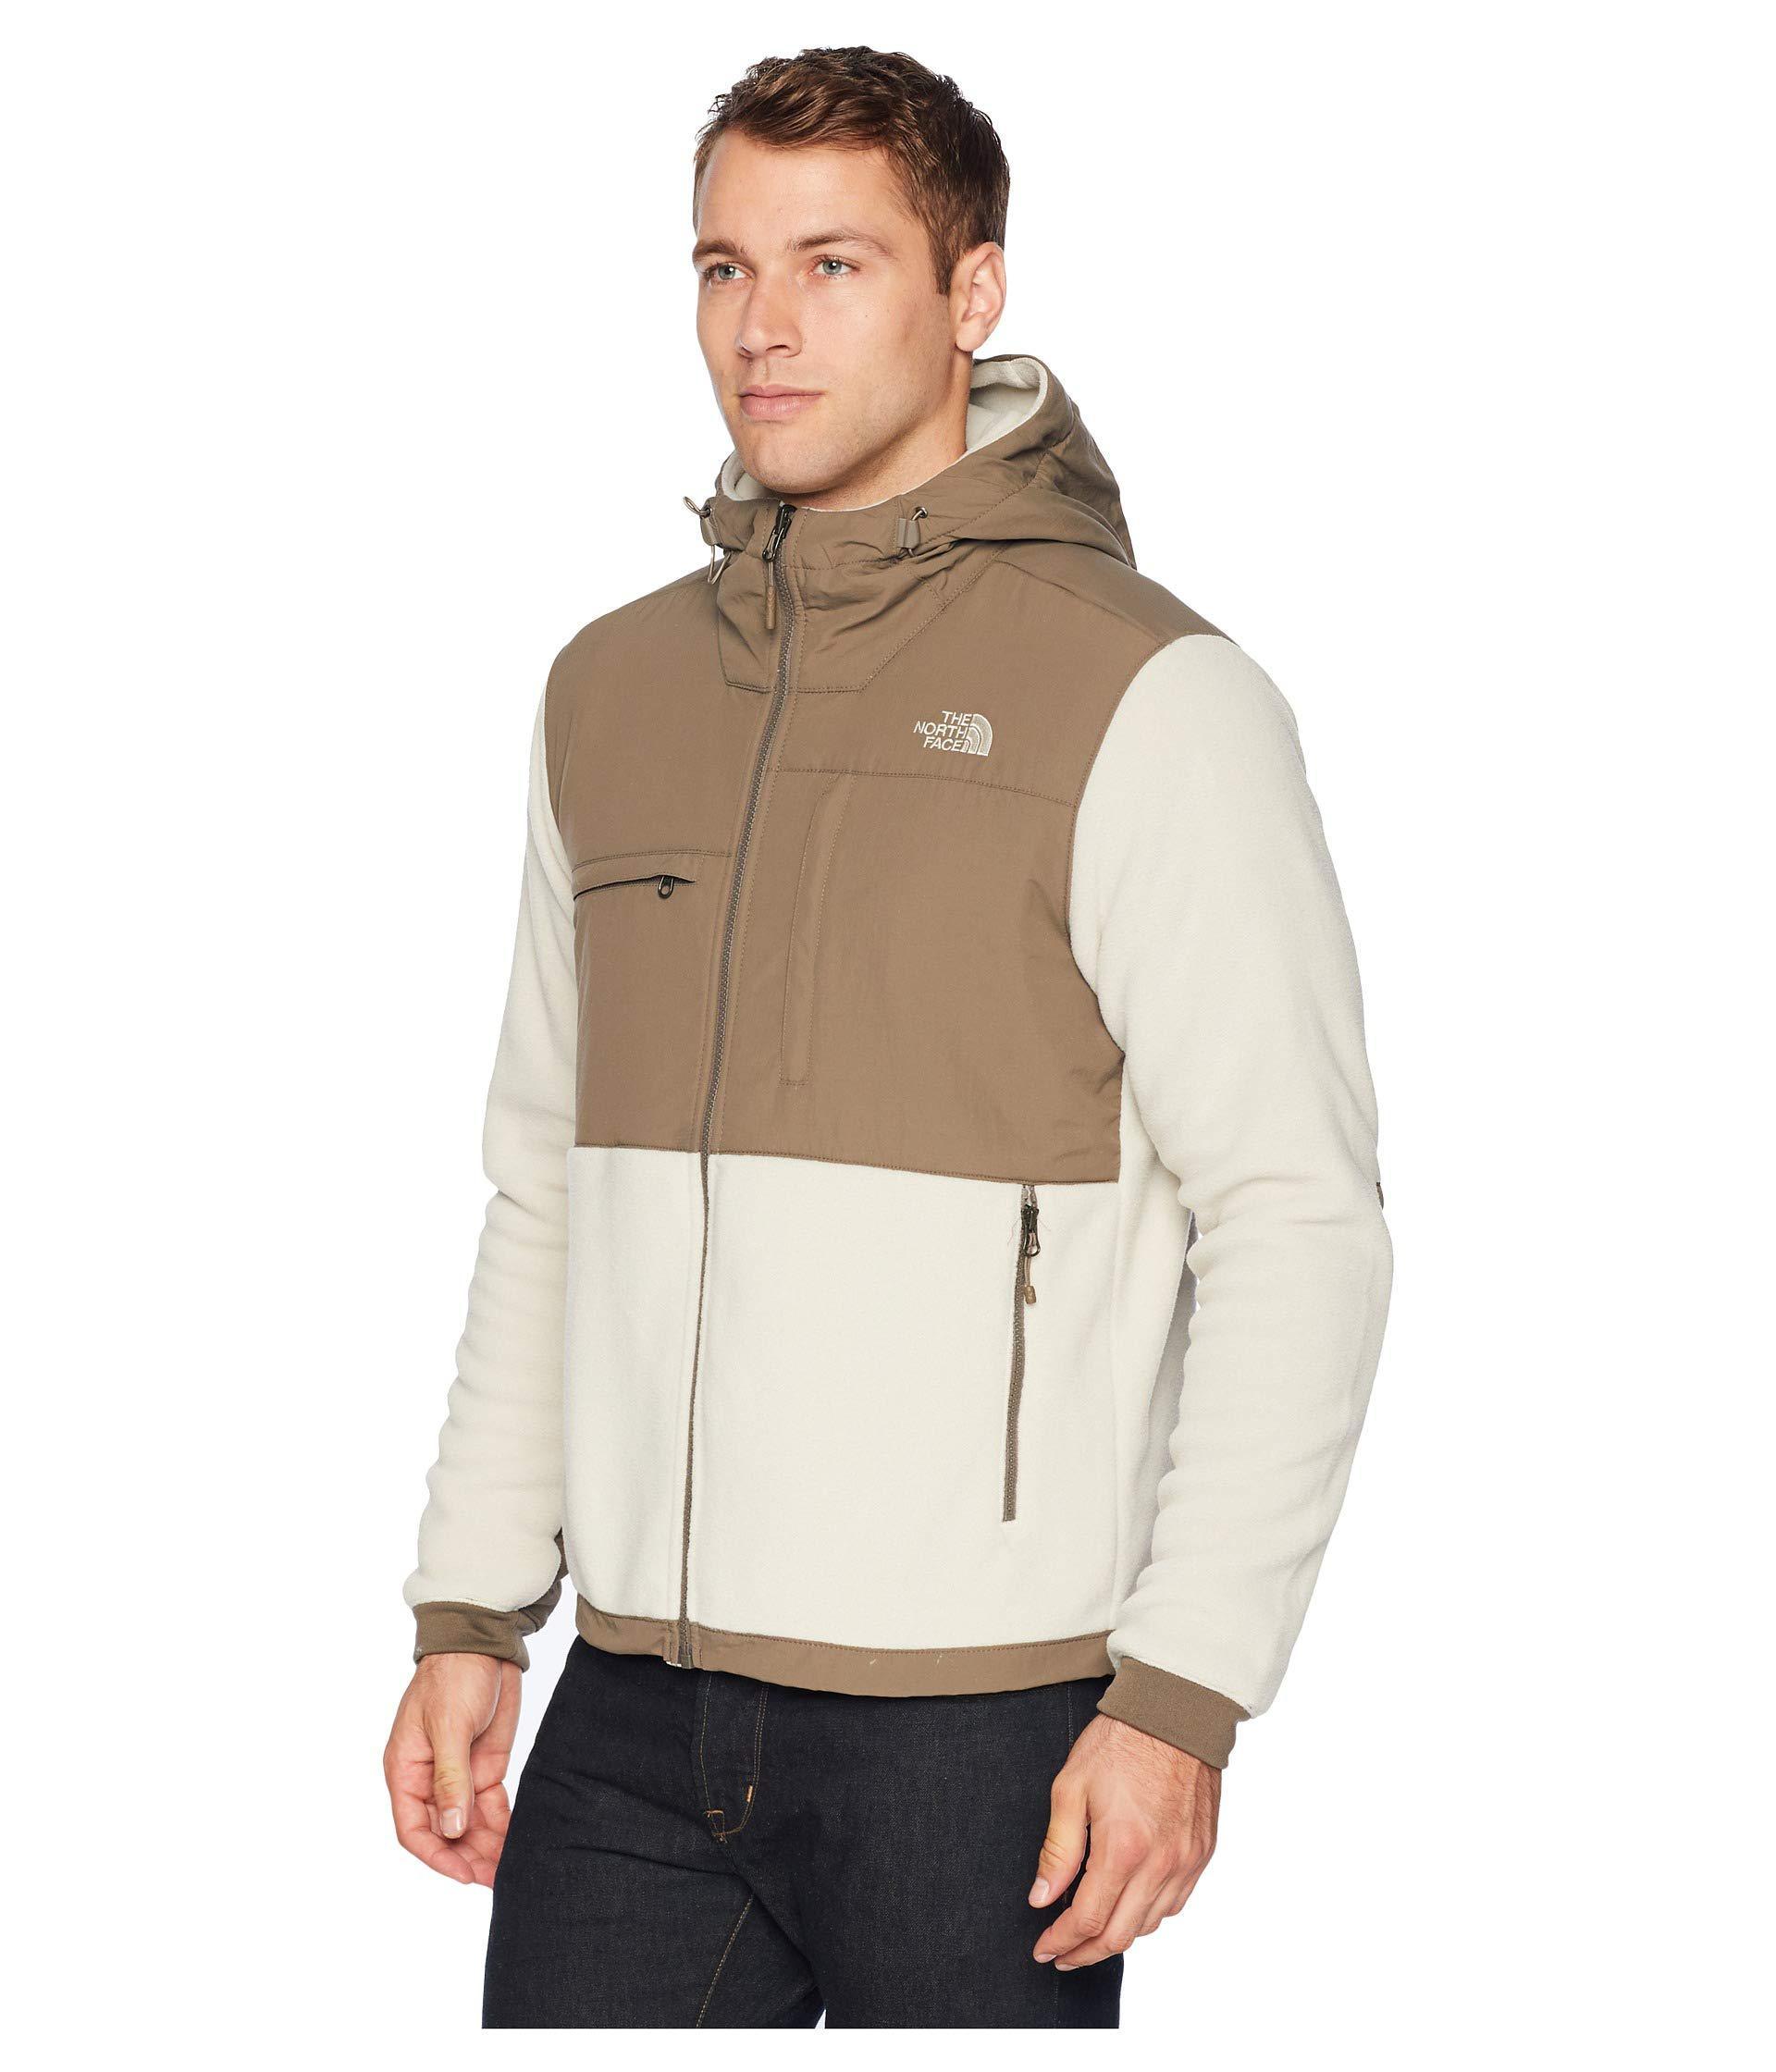 9e9cc8d03 The North Face Natural Denali 2 Hoodie (peyote Beige/weimaraner Brown 1)  Men's Sweatshirt for men